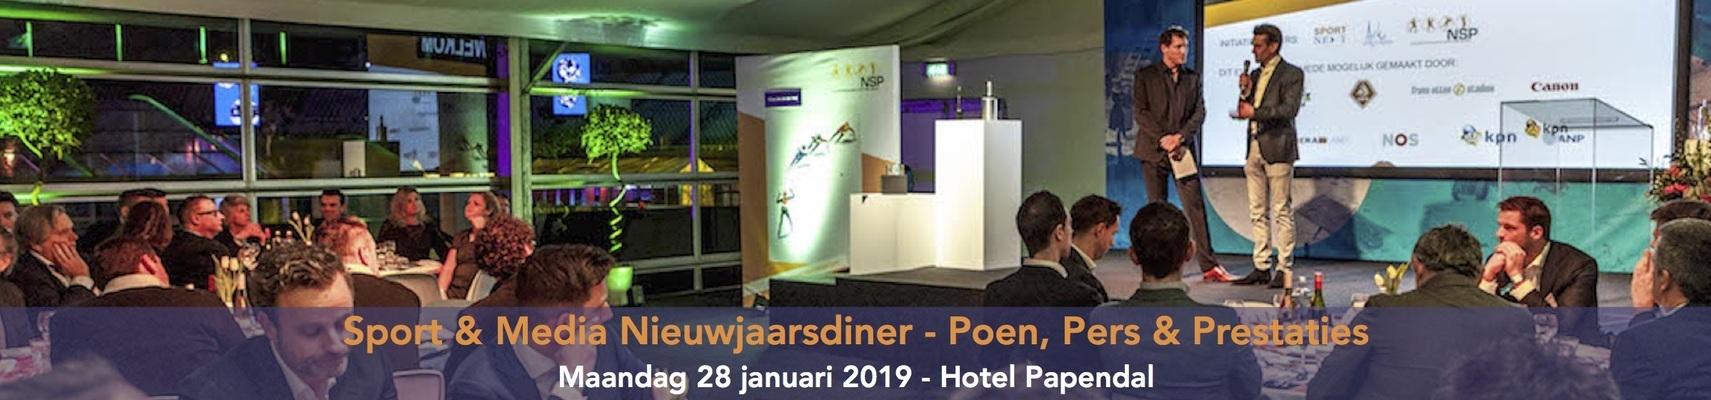 Sport & Media Nieuwjaarsdiner 2019